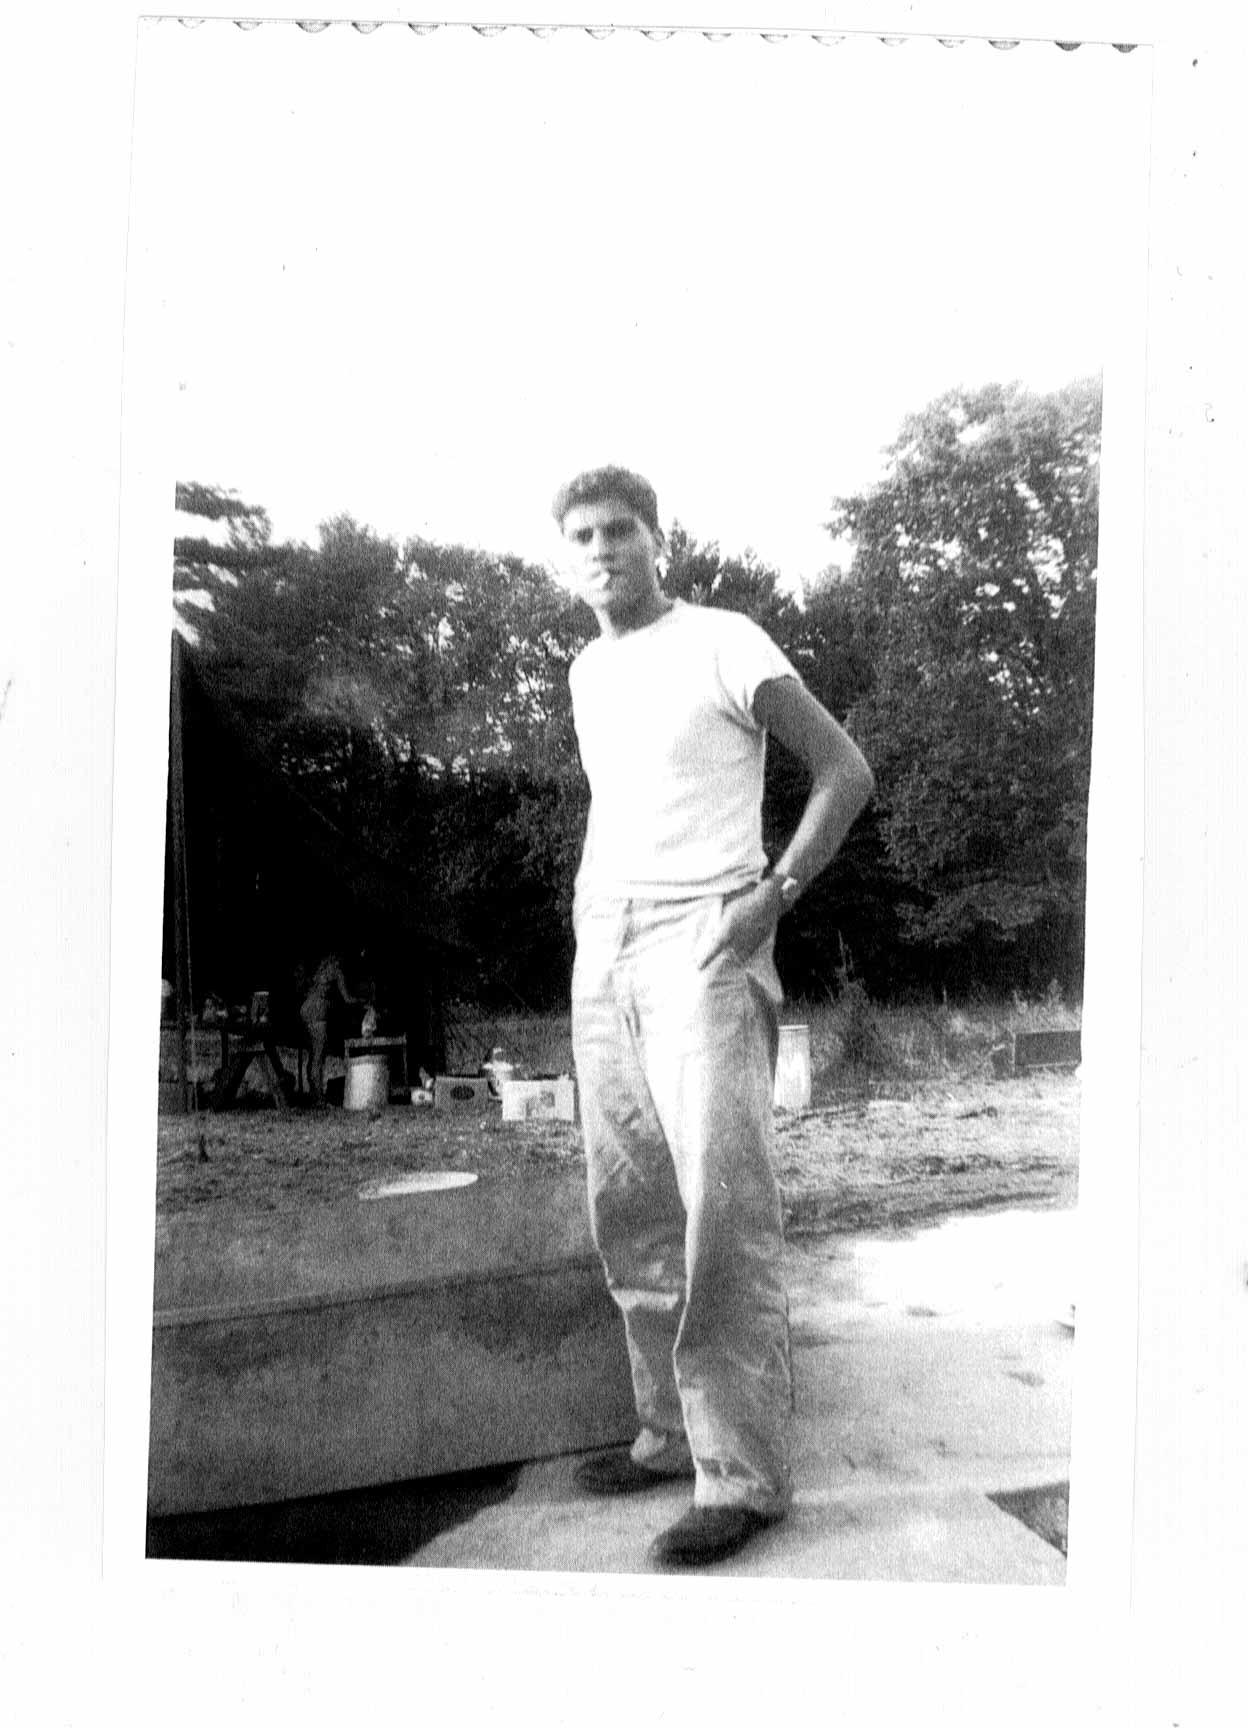 Stephen G. Esrati post Baalbek prison, 1948